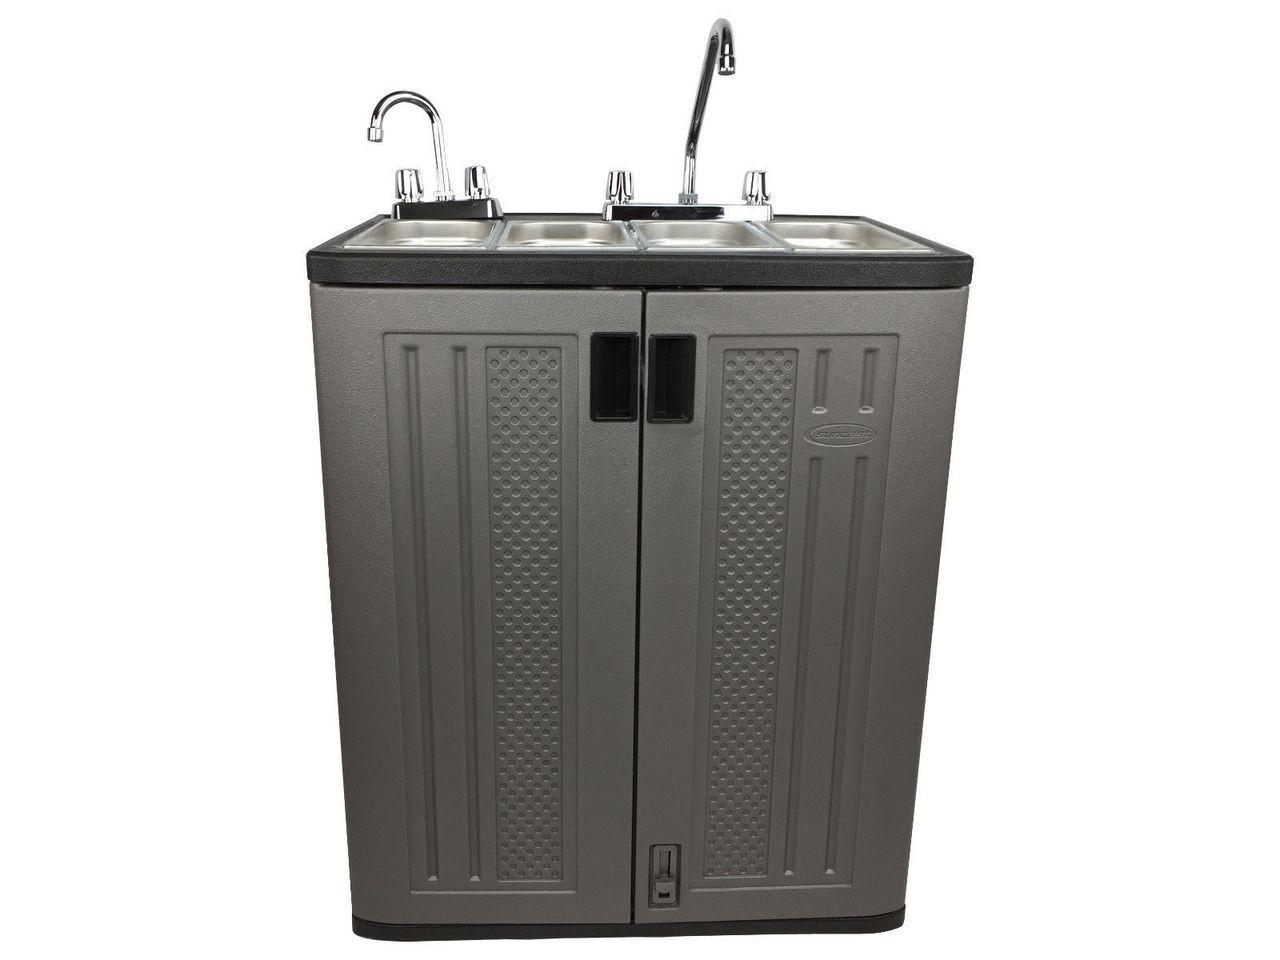 4 compartment concession sink